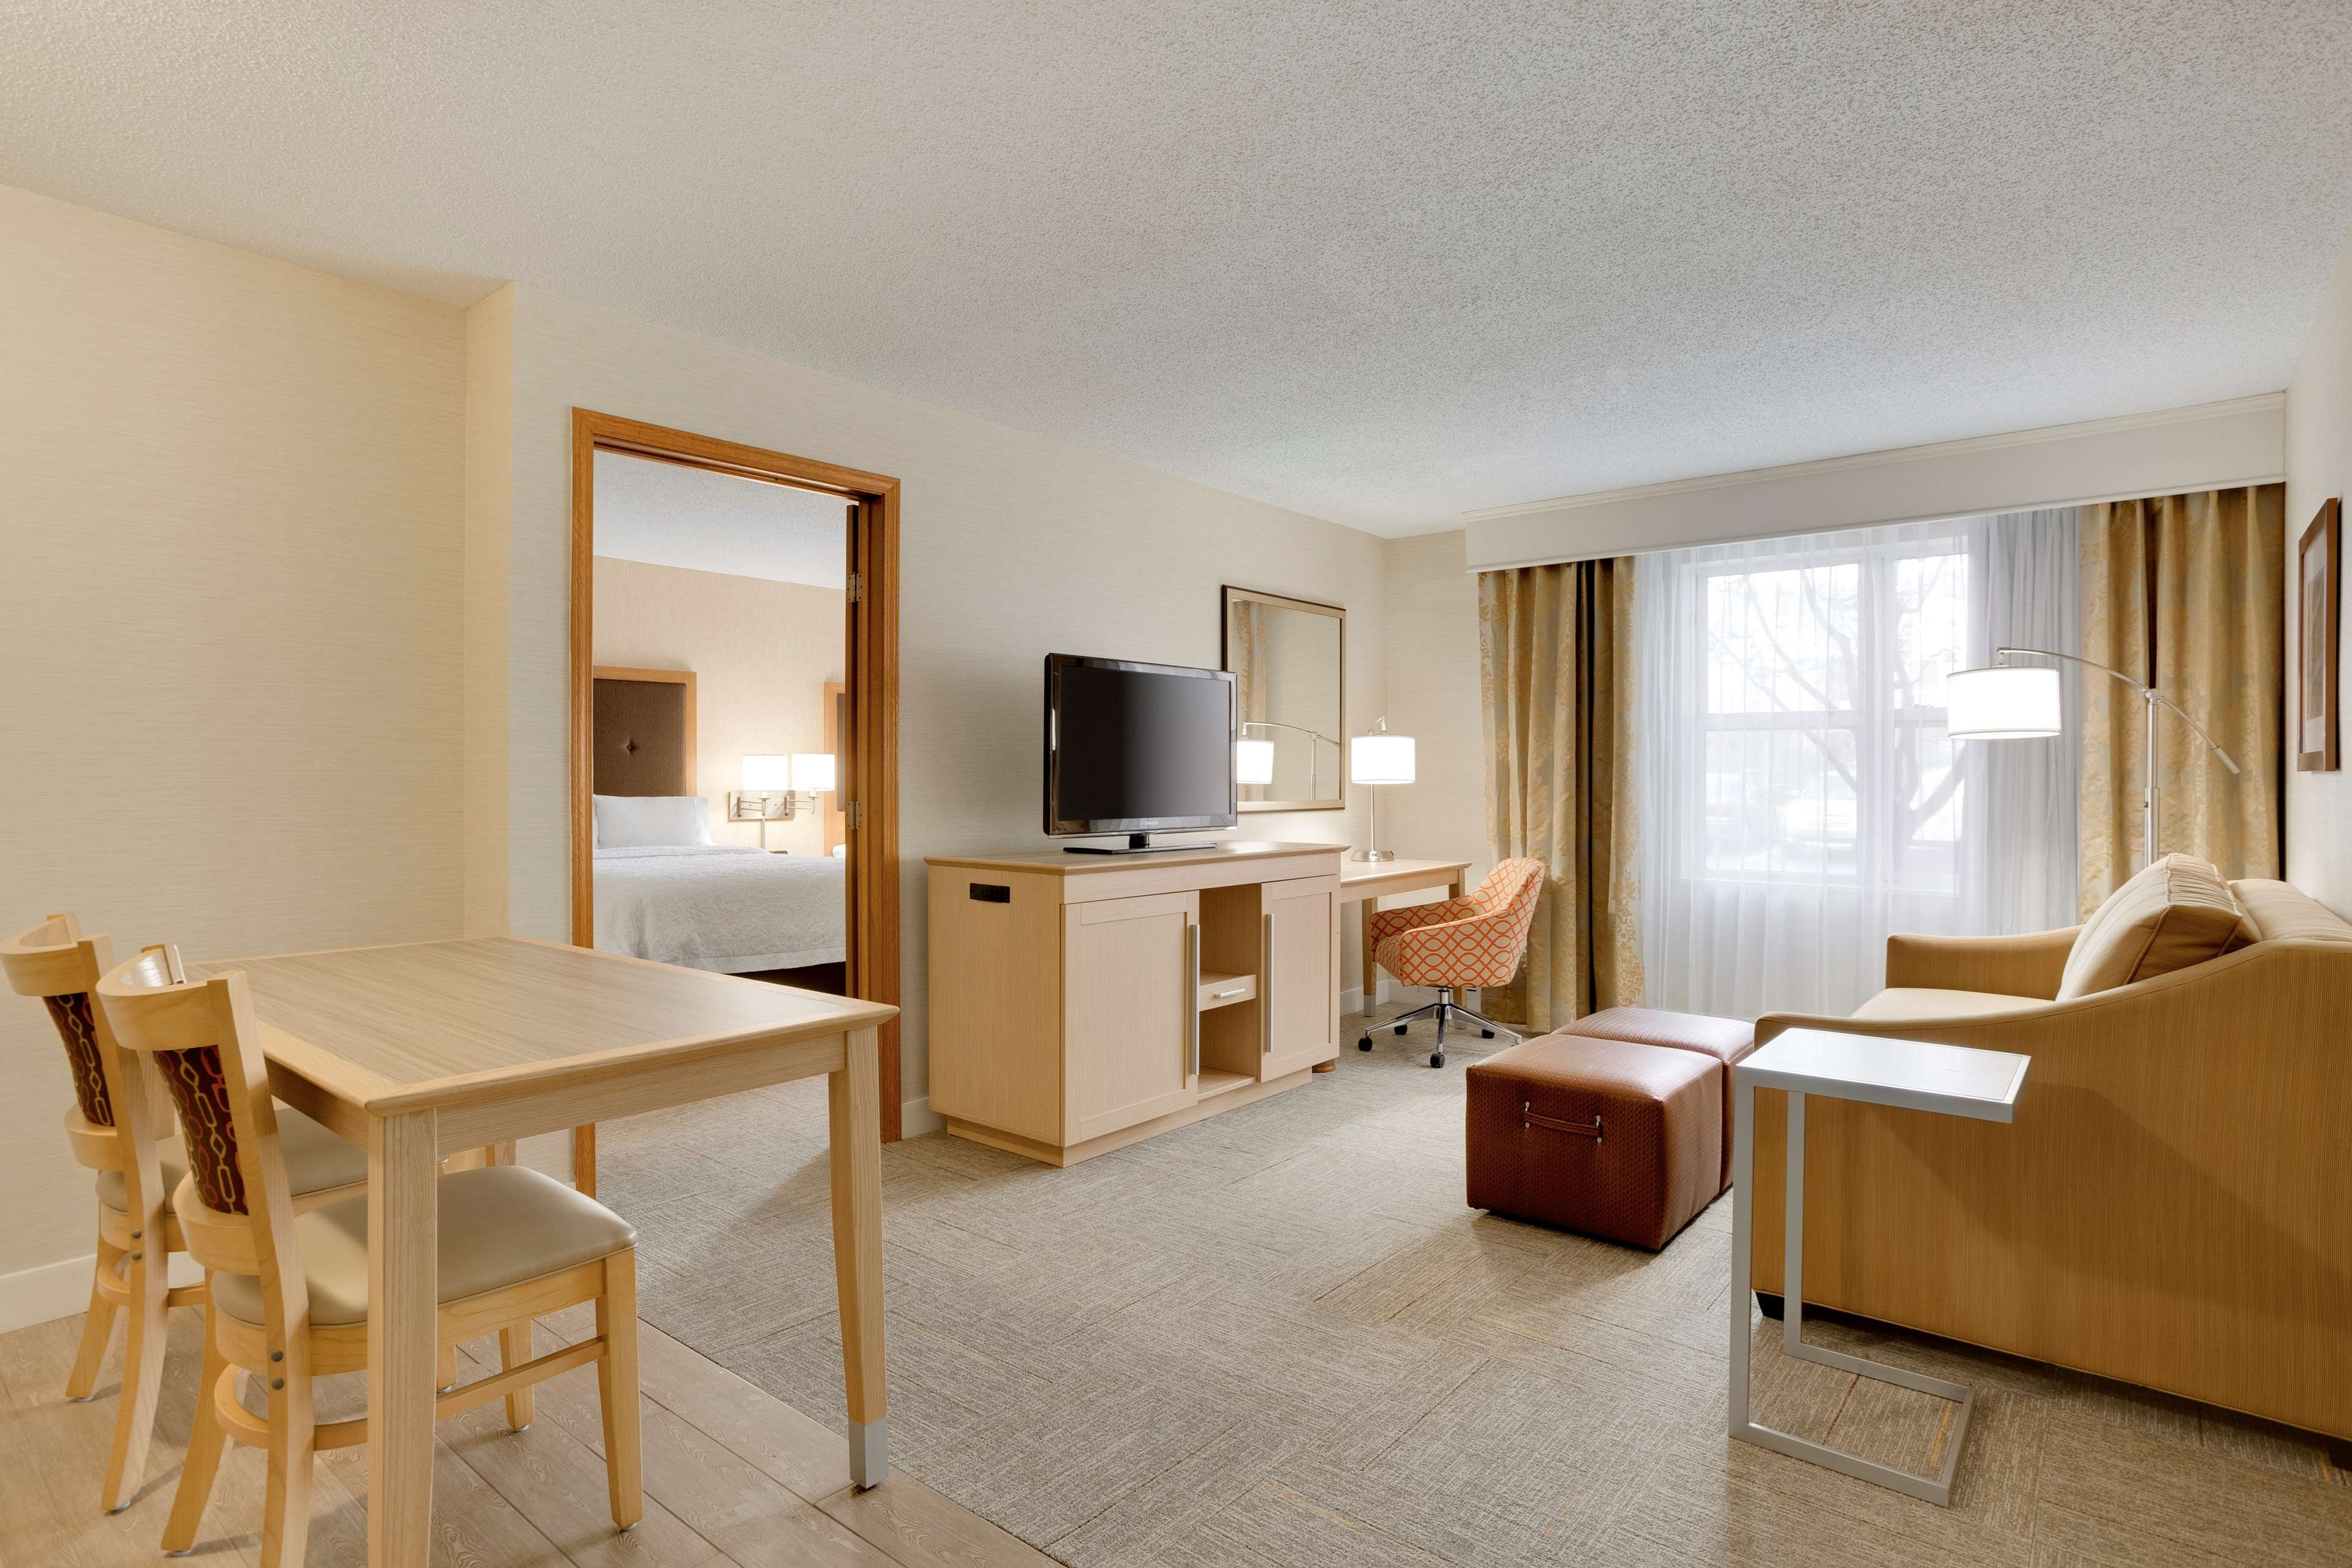 Hampton Inn & Suites Cleveland/Independence image 14